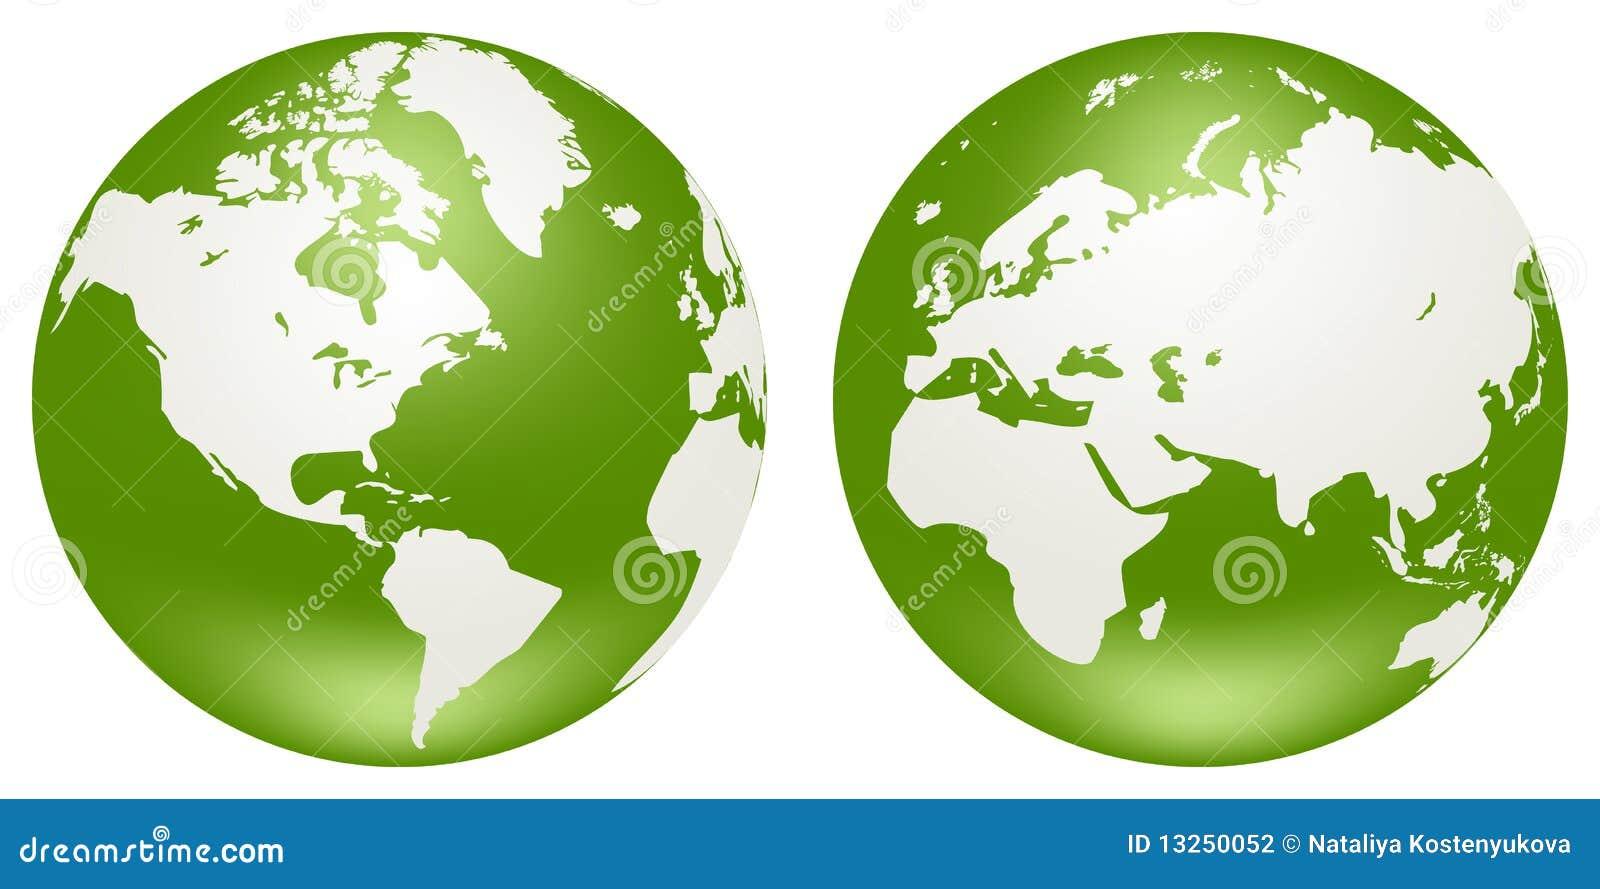 Globes of Earth